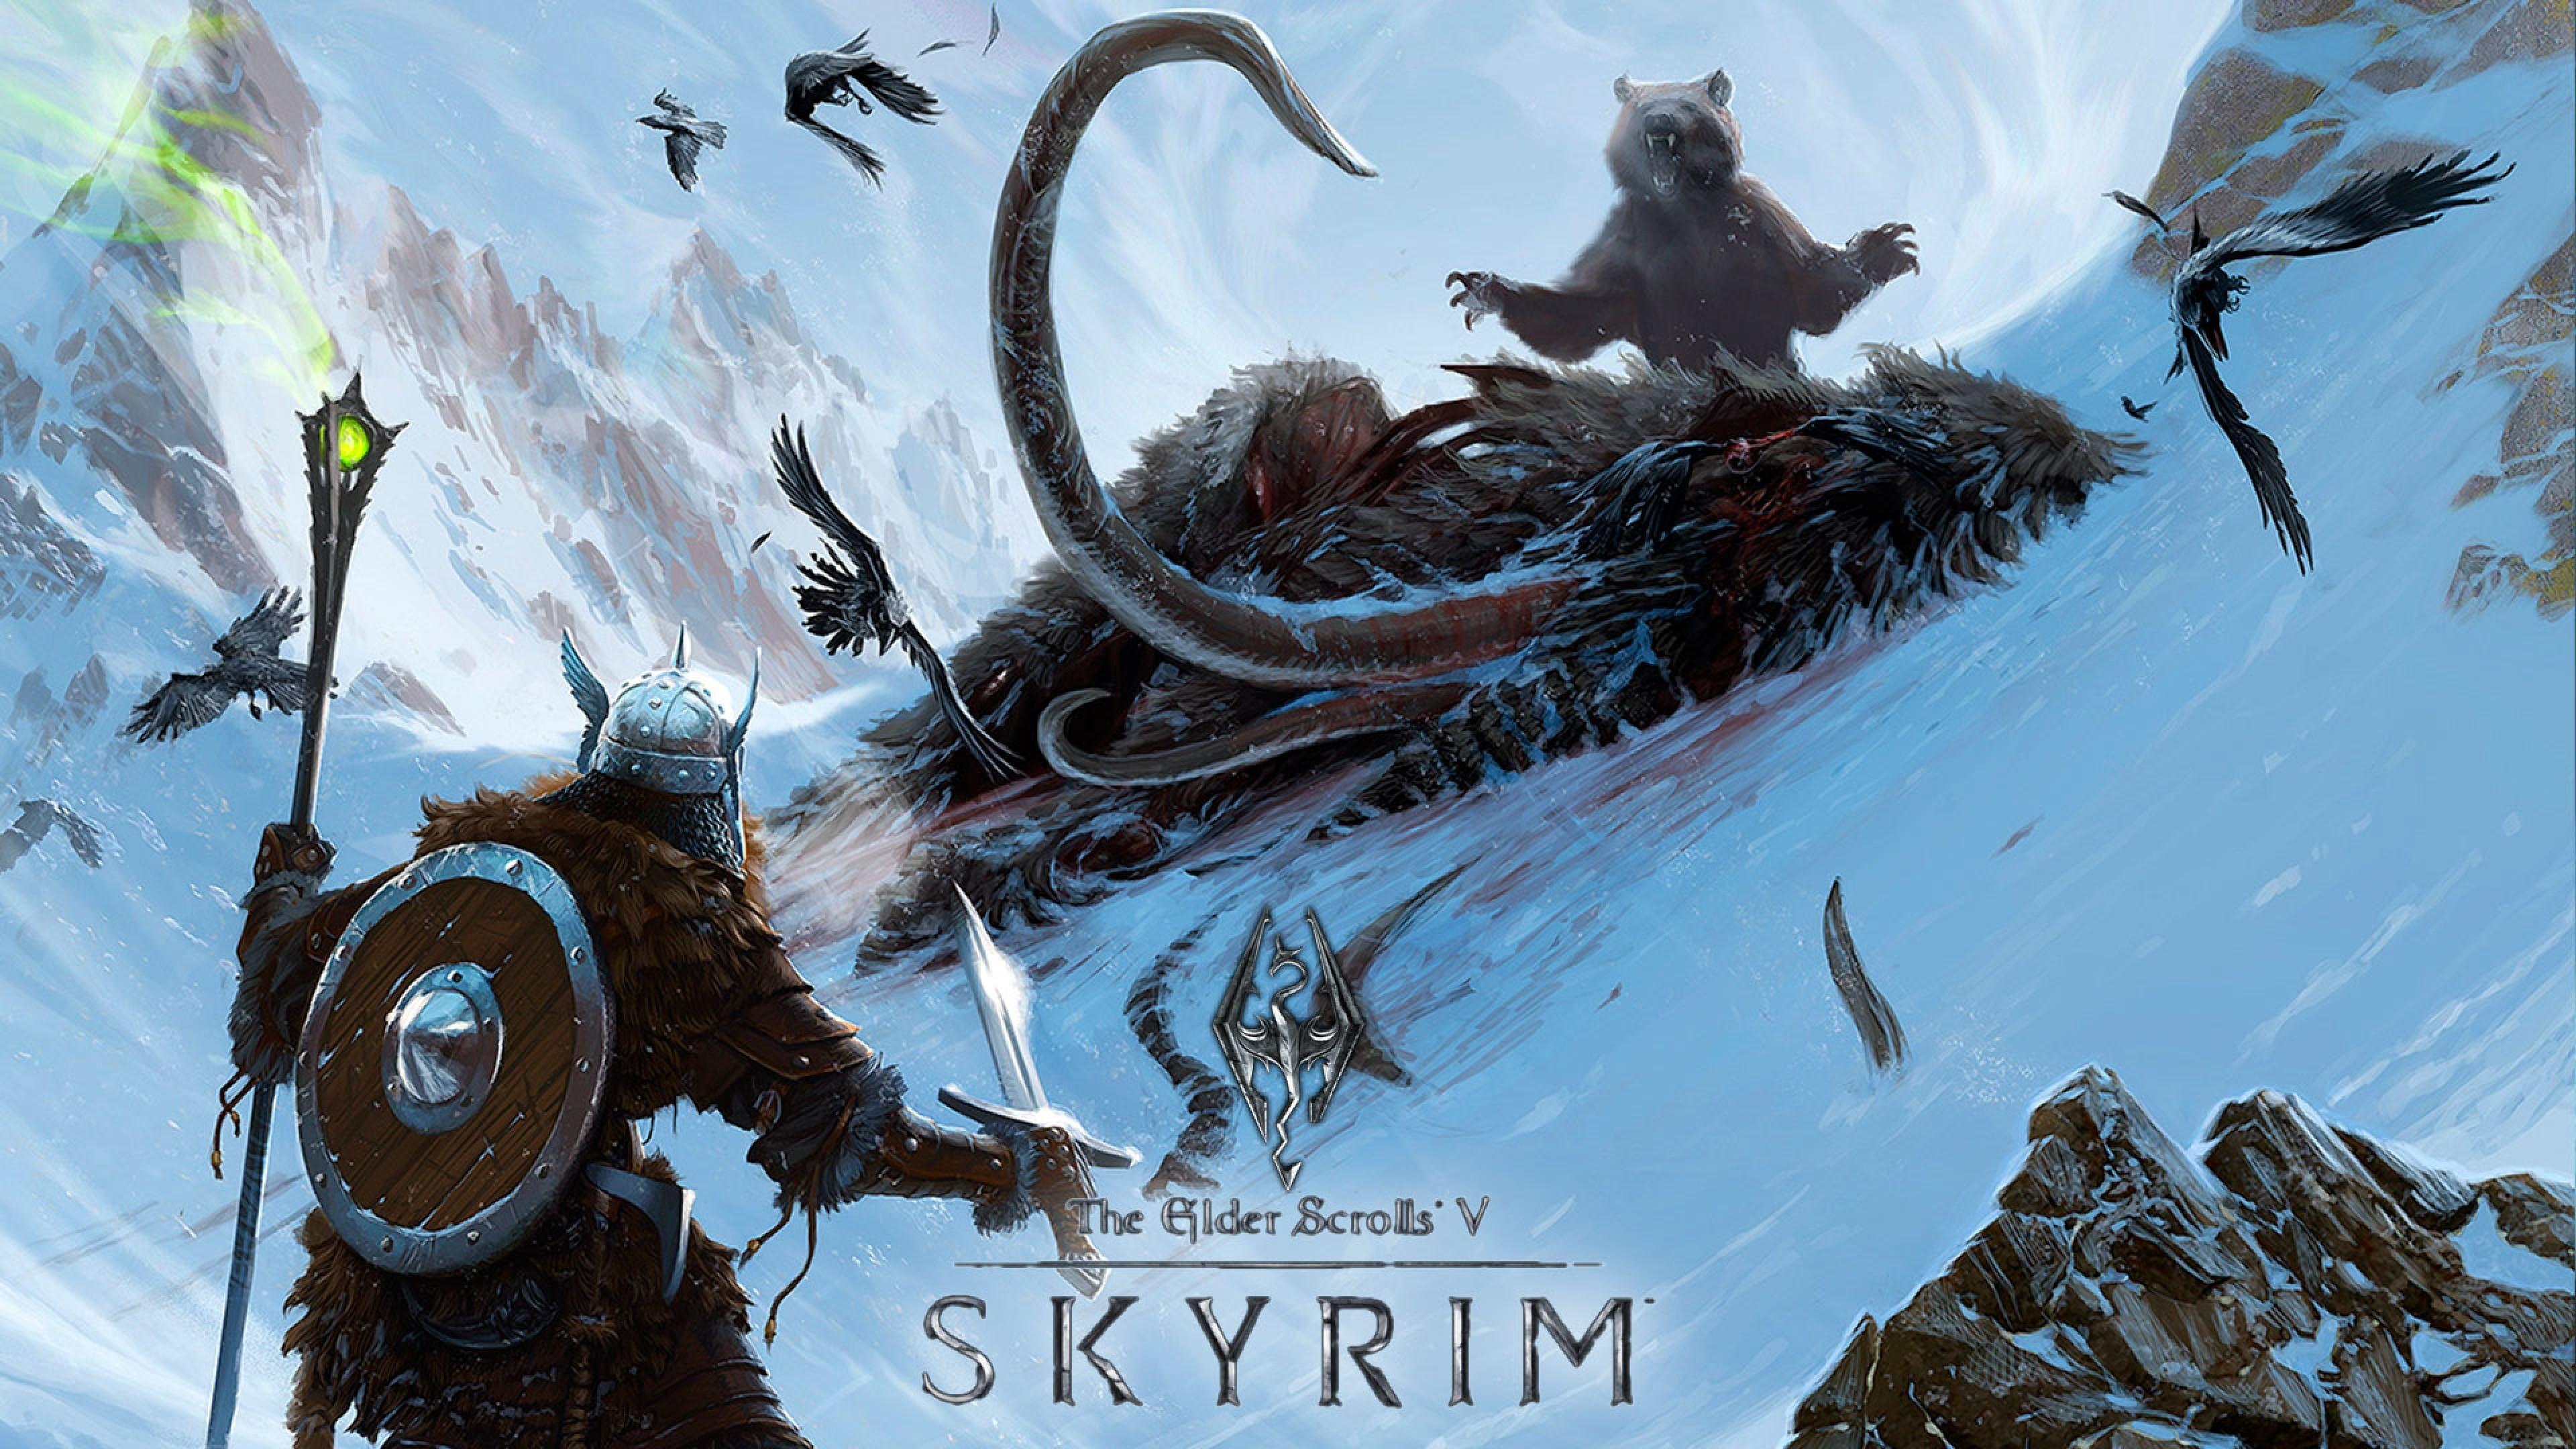 Wallpaper the elder scrolls skyrim, bear, mountain, staff, mammoth